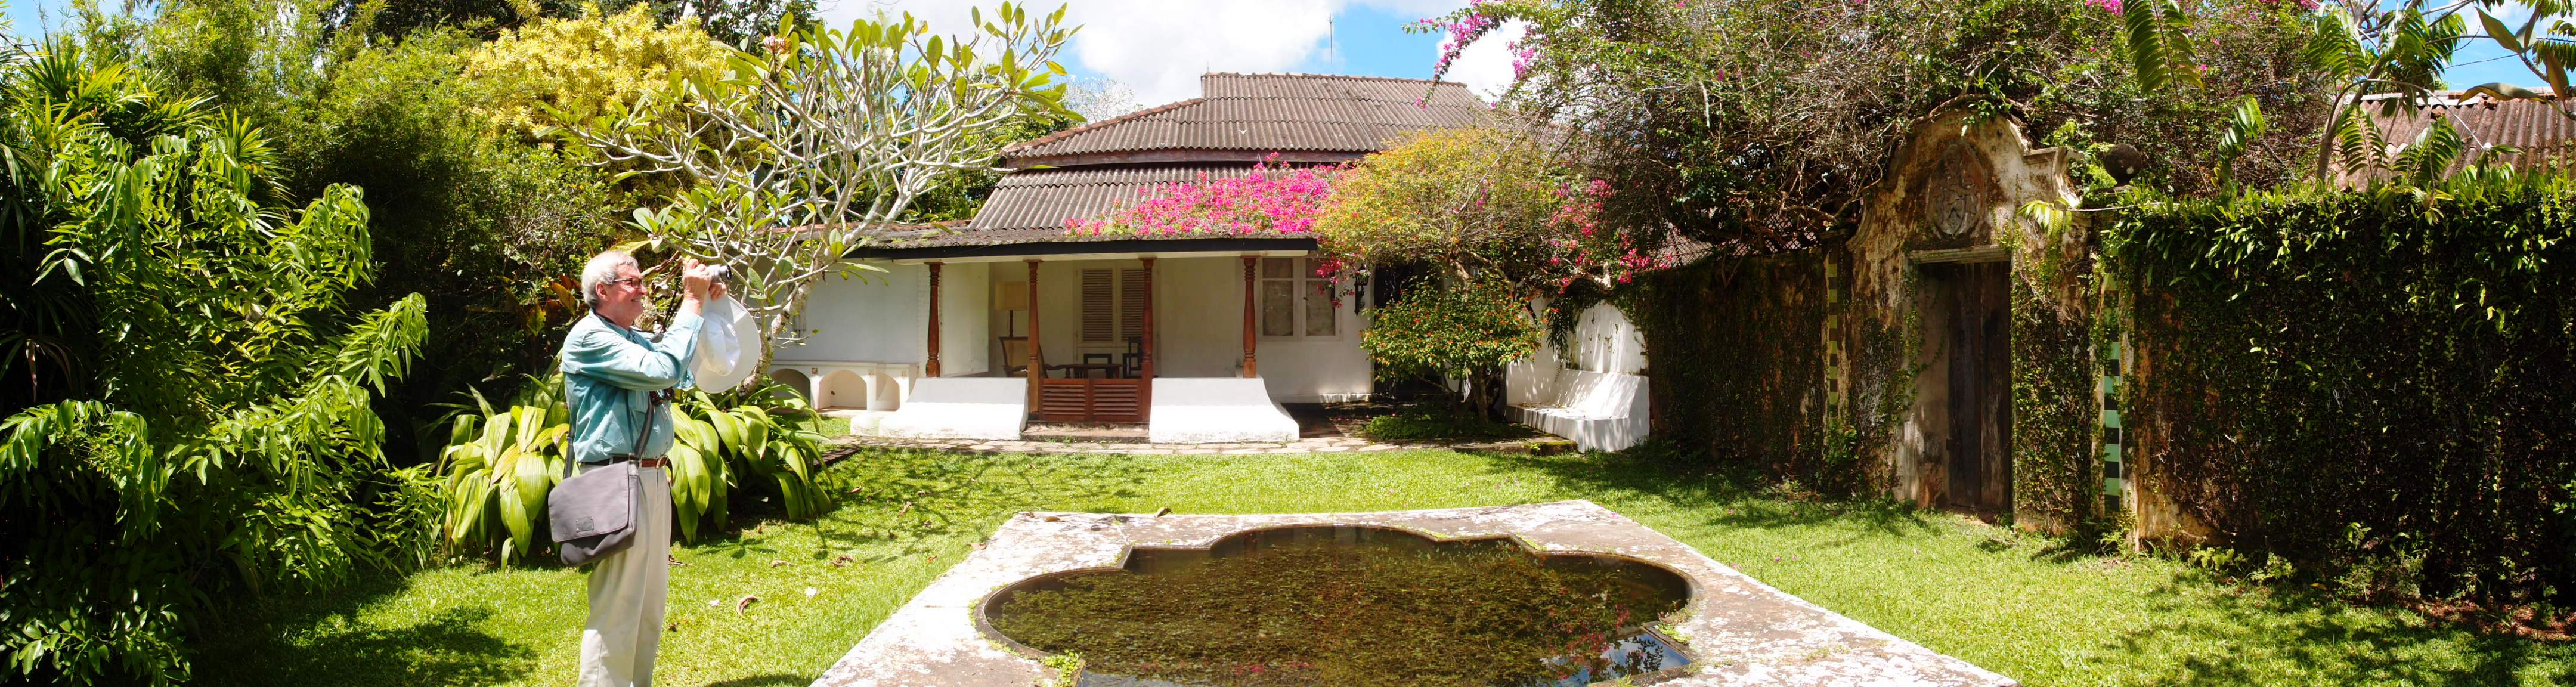 Brief\': The home and garden of Bevis Bawa, Sri Lanka   Art-random